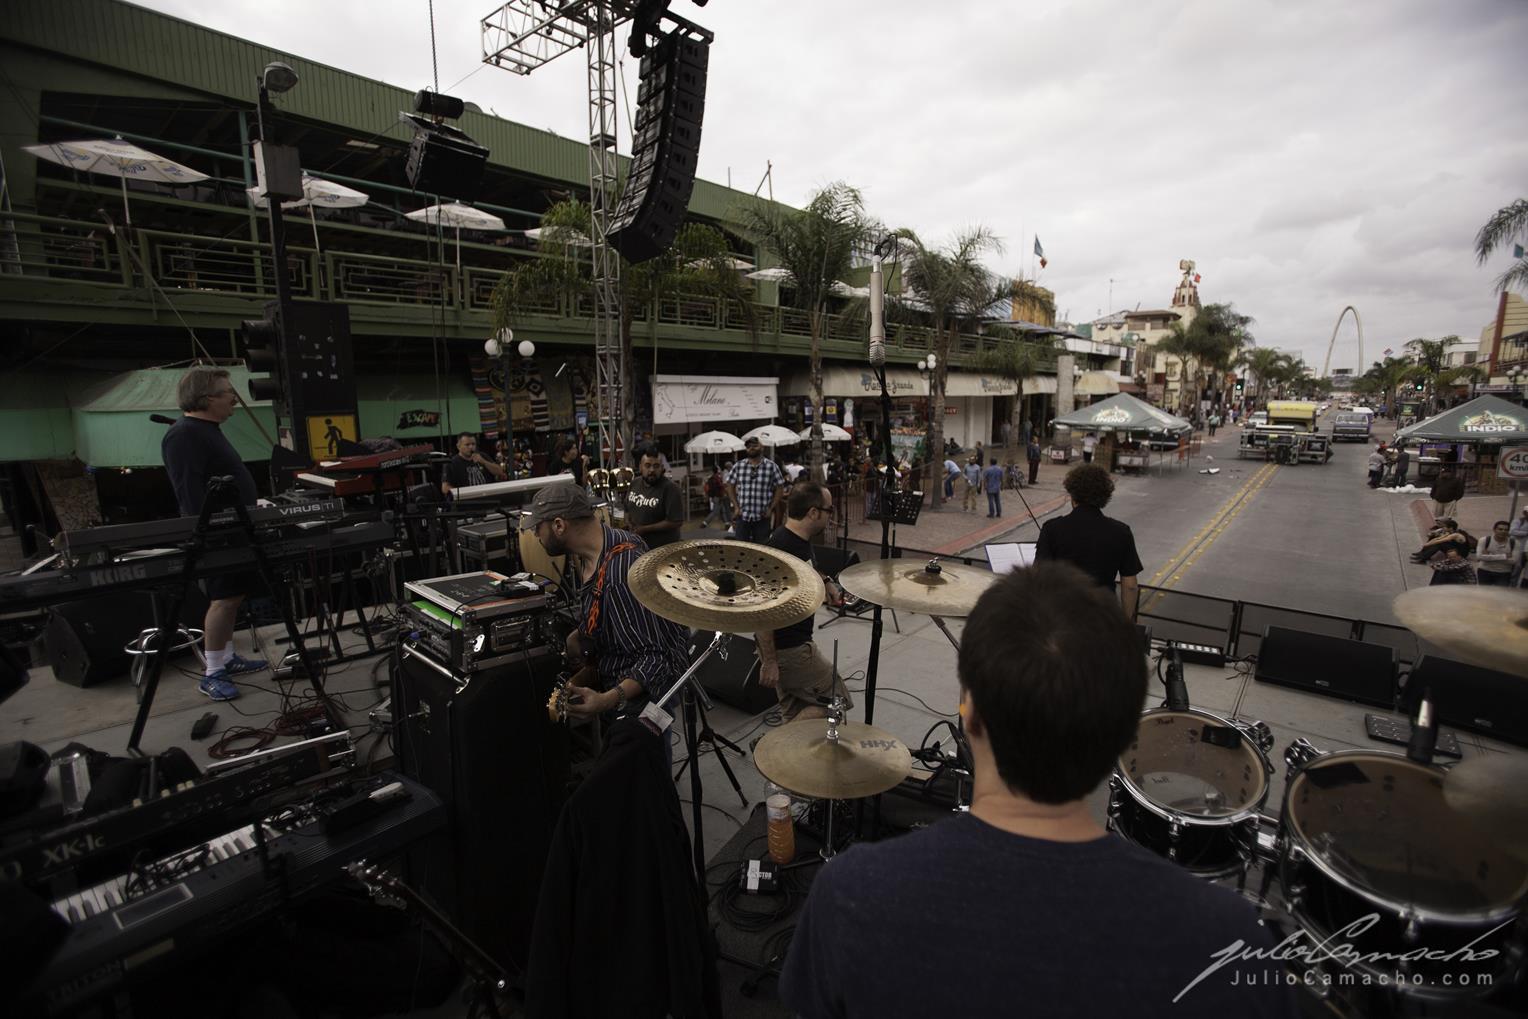 2014-10-30 31 CAST TOUR Ensenada y Tijuana - 1000 - www.Juli (Copy).jpg